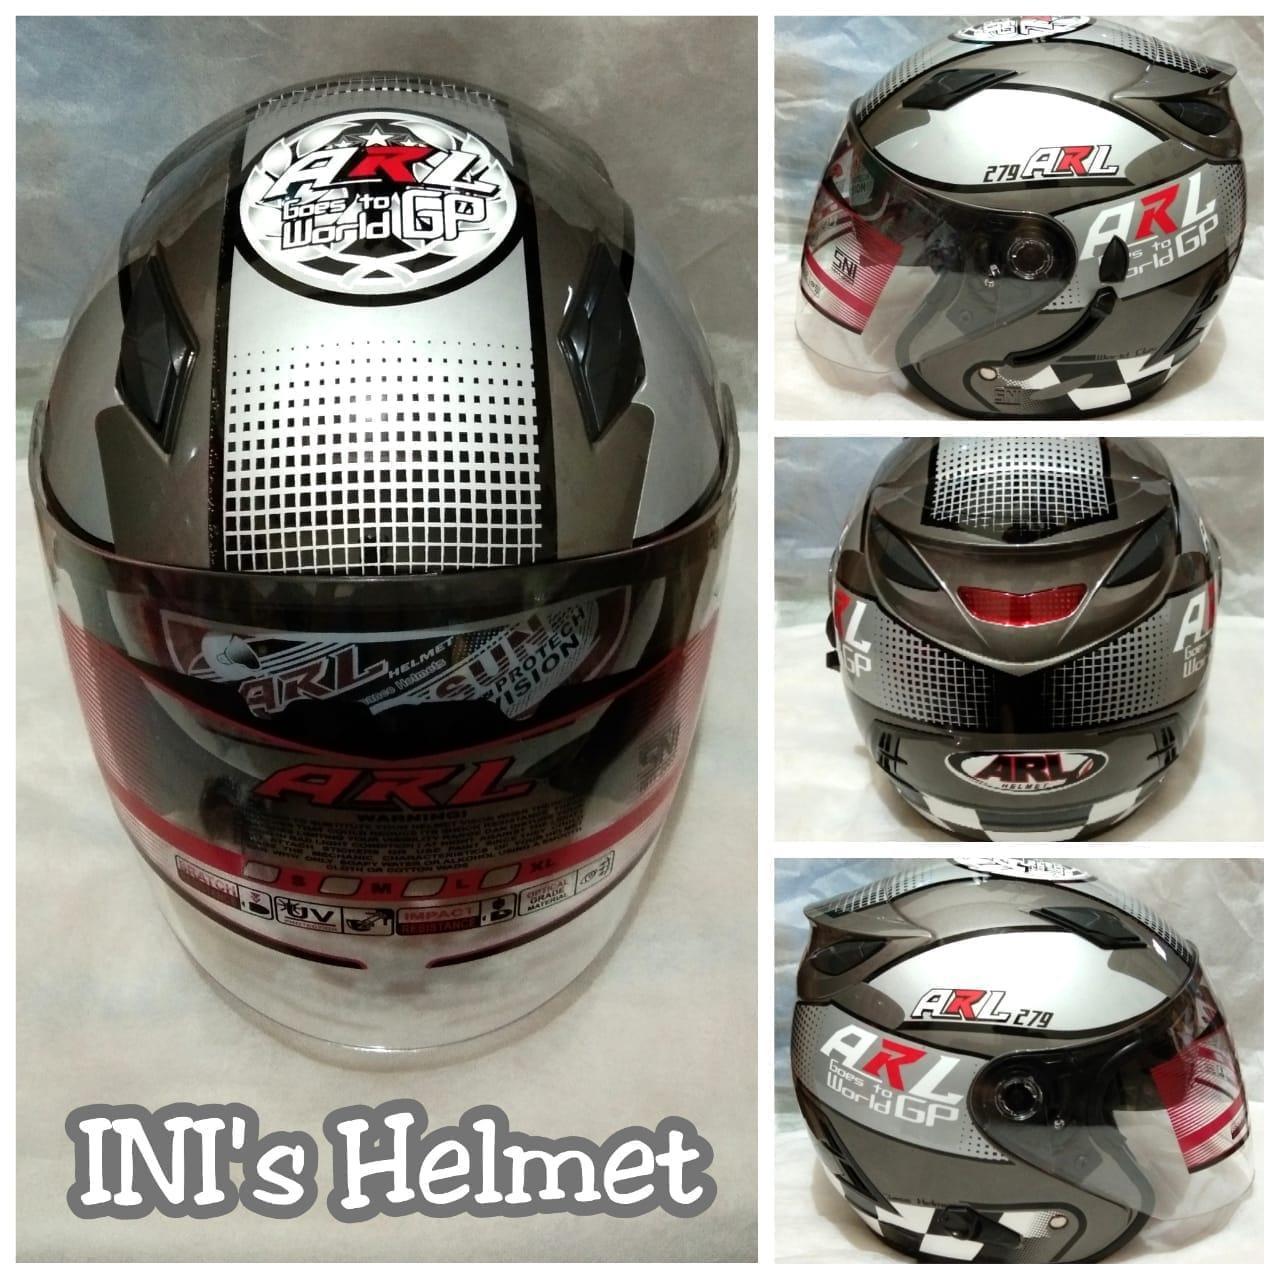 Helm Grey Goes To MotoGP Dewasa SNI Double Visor 2 kaca ( Premium Helmet with Low Budget )